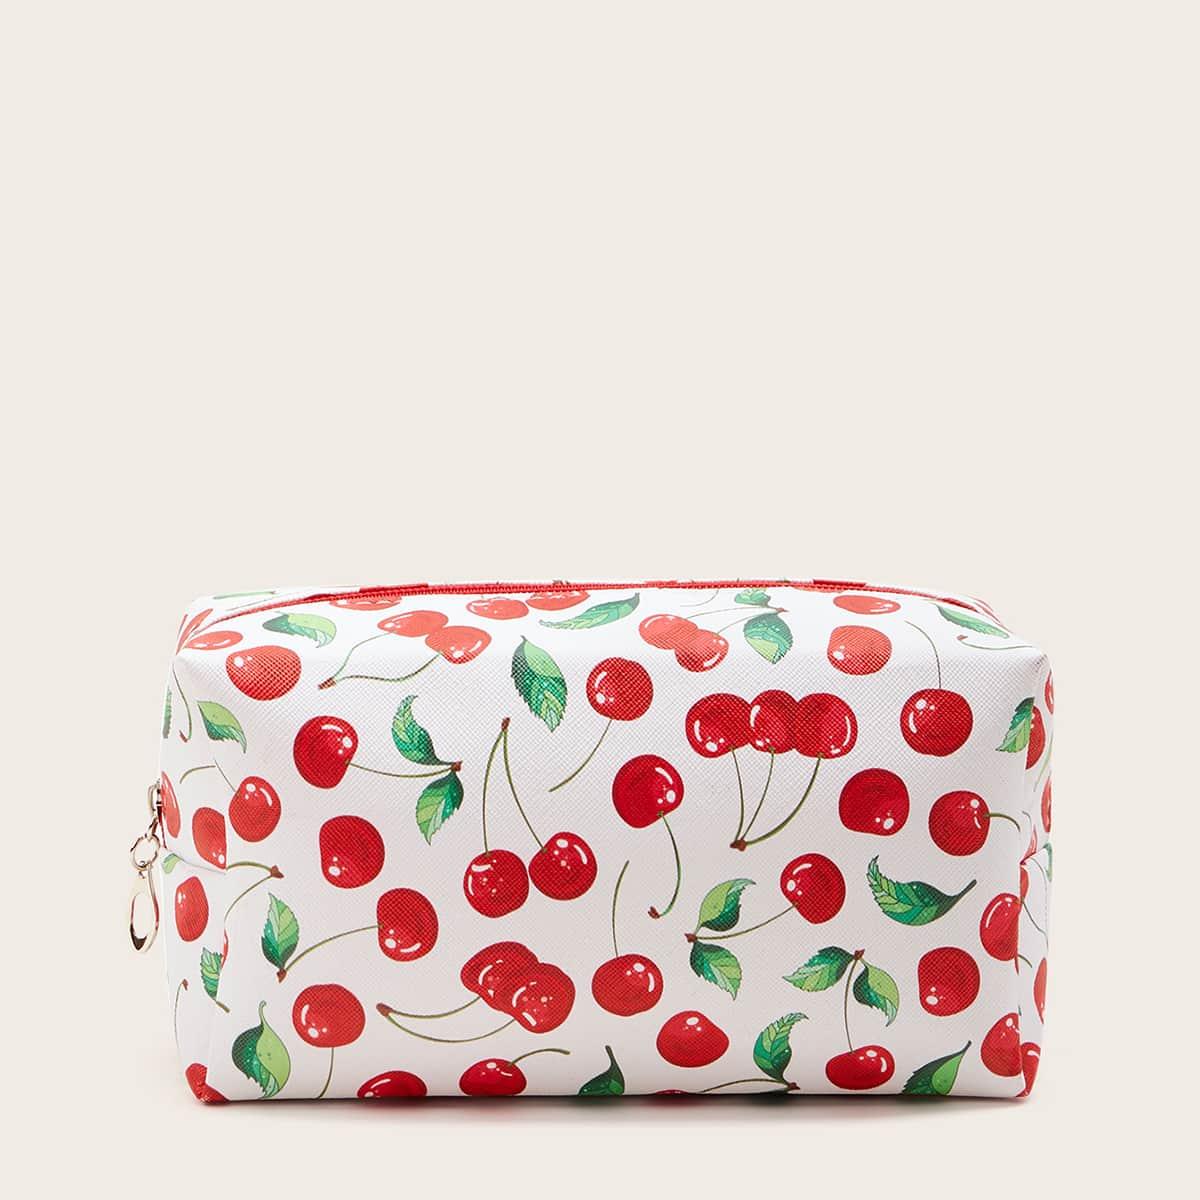 Косметическая сумка с узором вишни фото